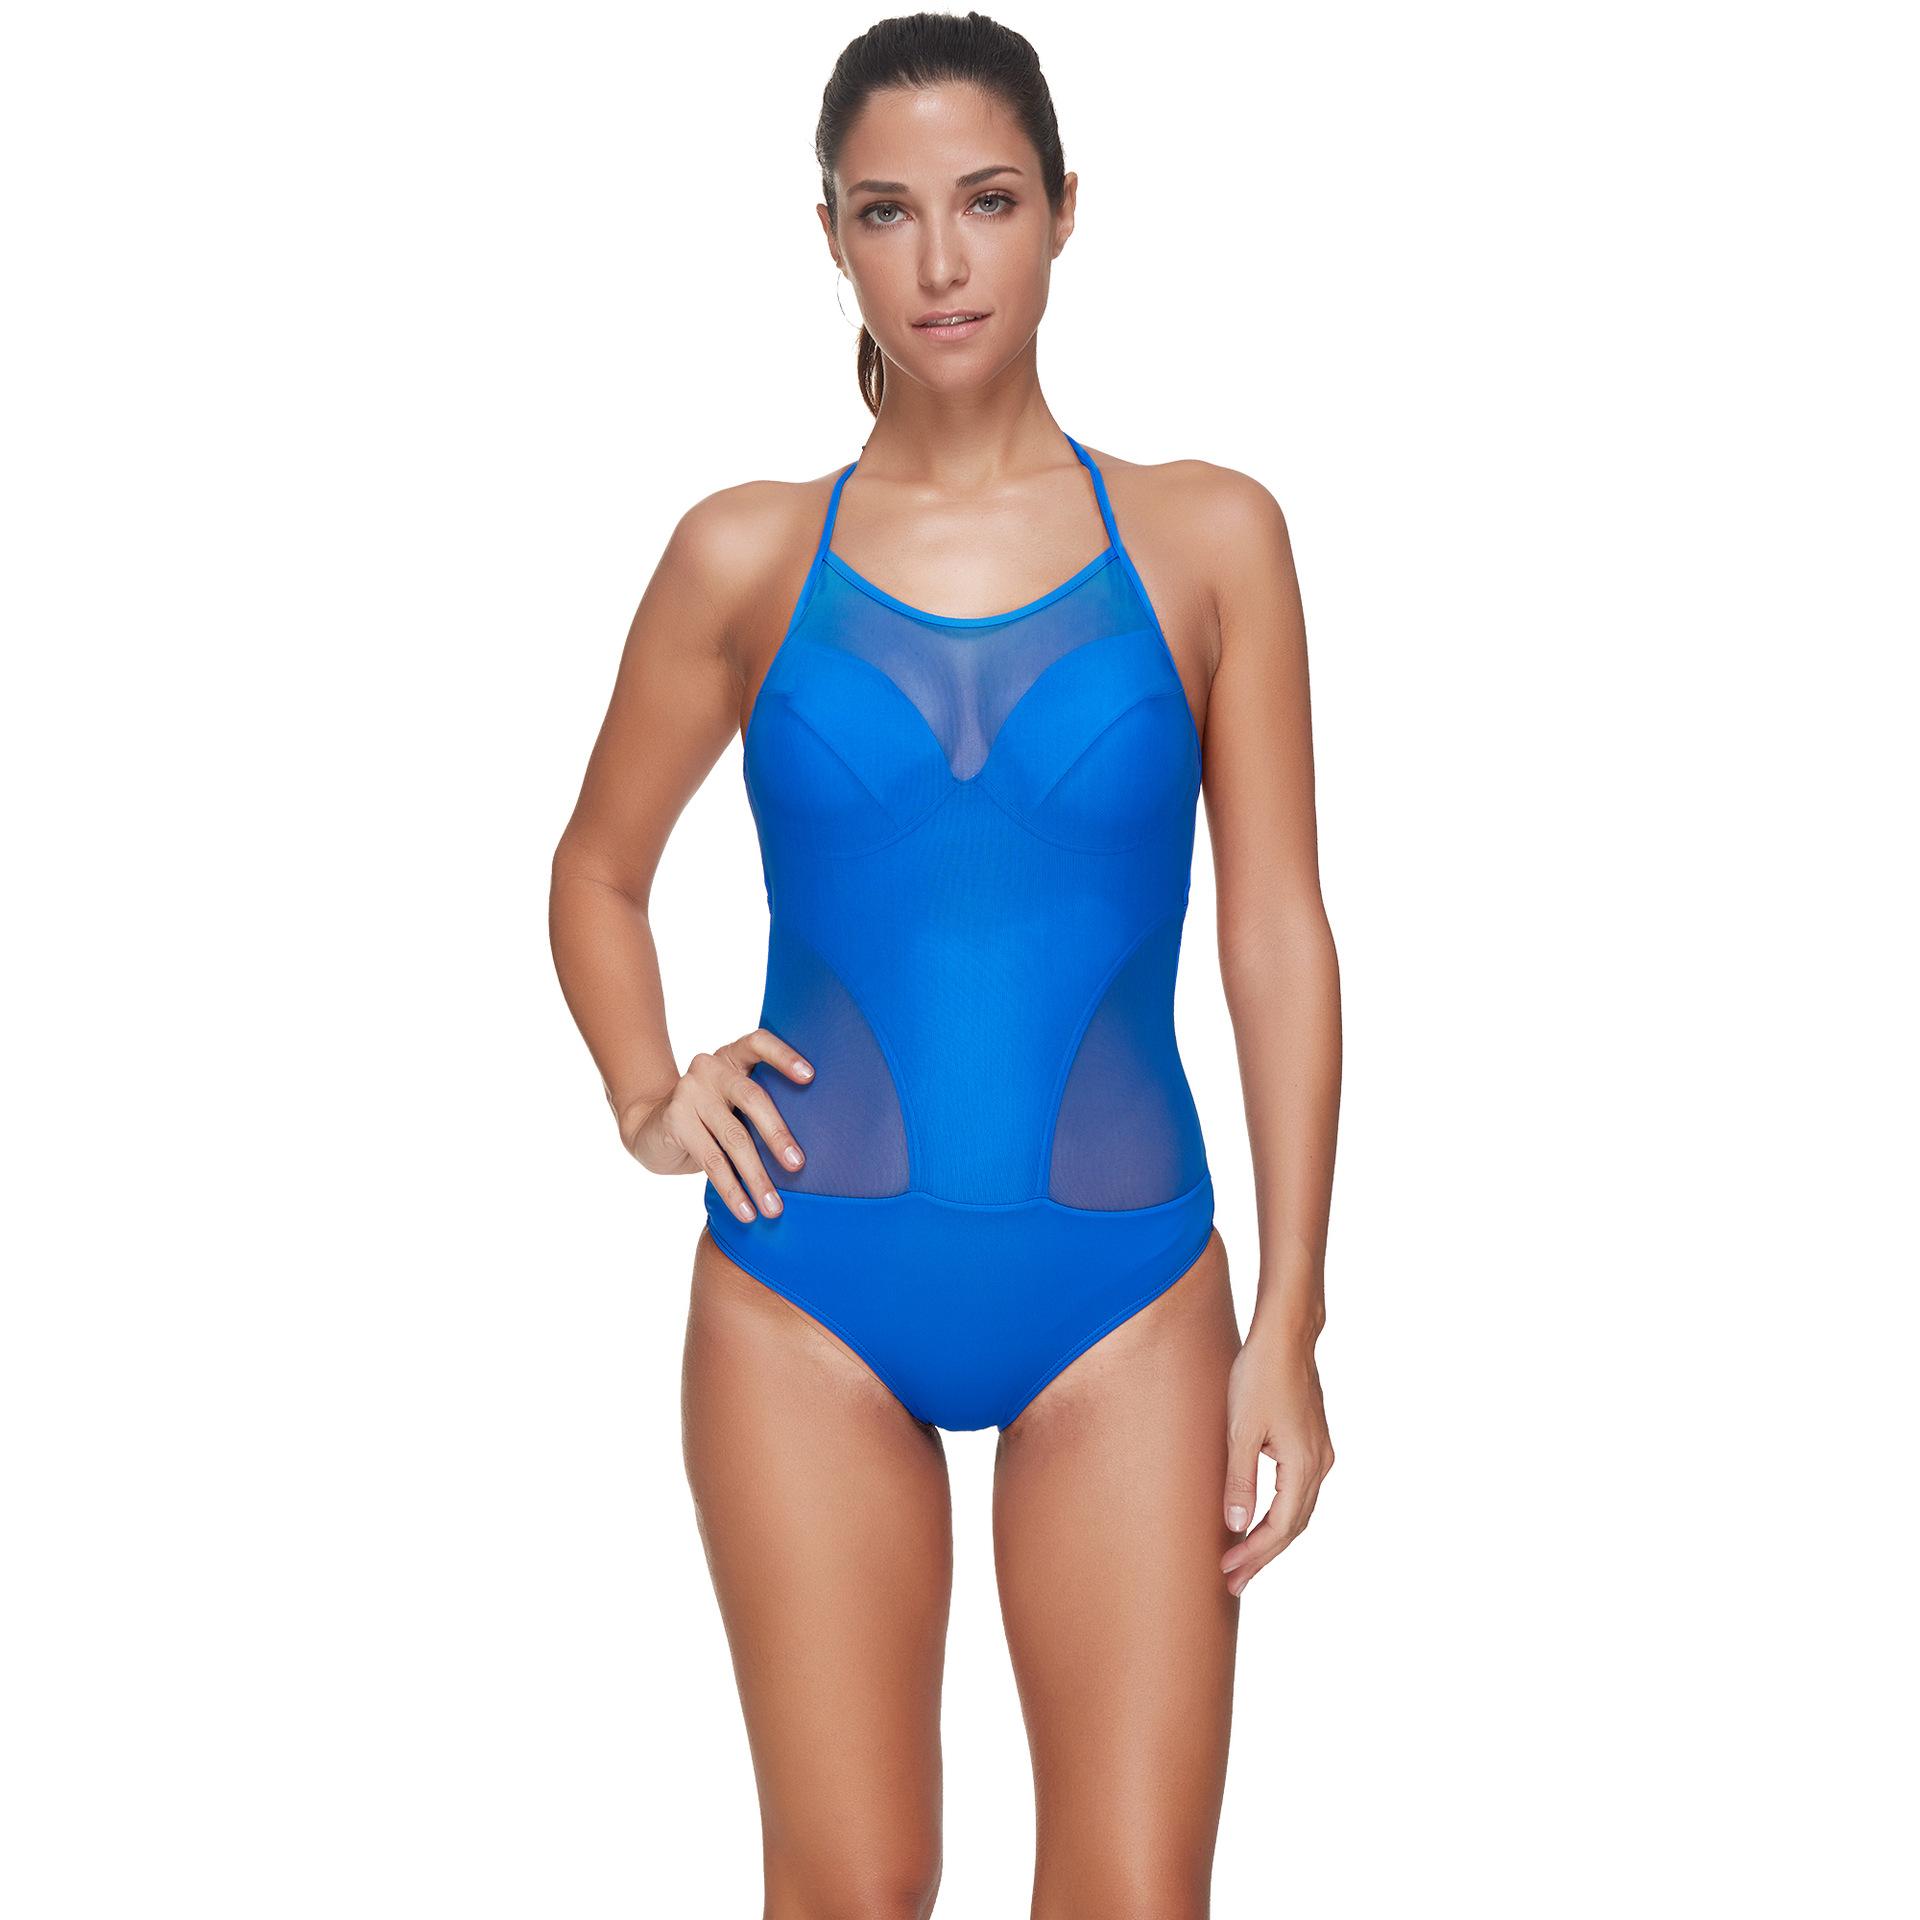 Cotton Sexy & PartySwimwear(LS1069-M) NHYS0097-LS1069-M